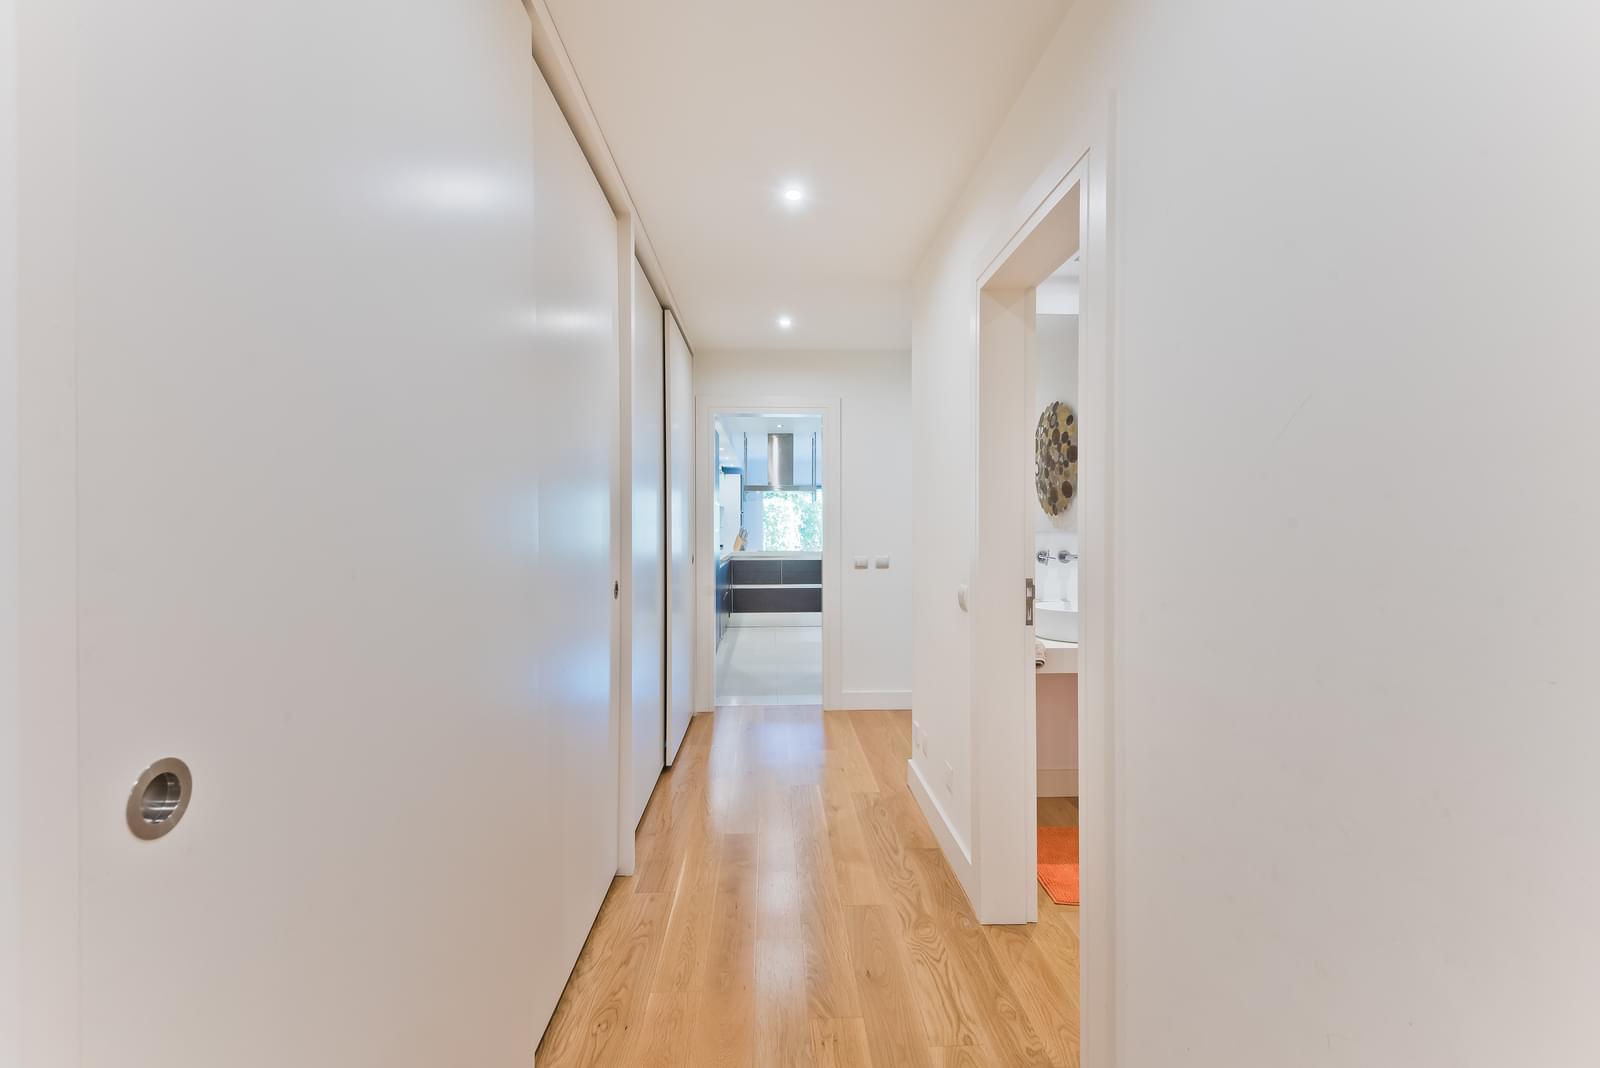 pf18836-apartamento-t3-cascais-c2922884-27f9-4ea8-b041-90a08cf61974